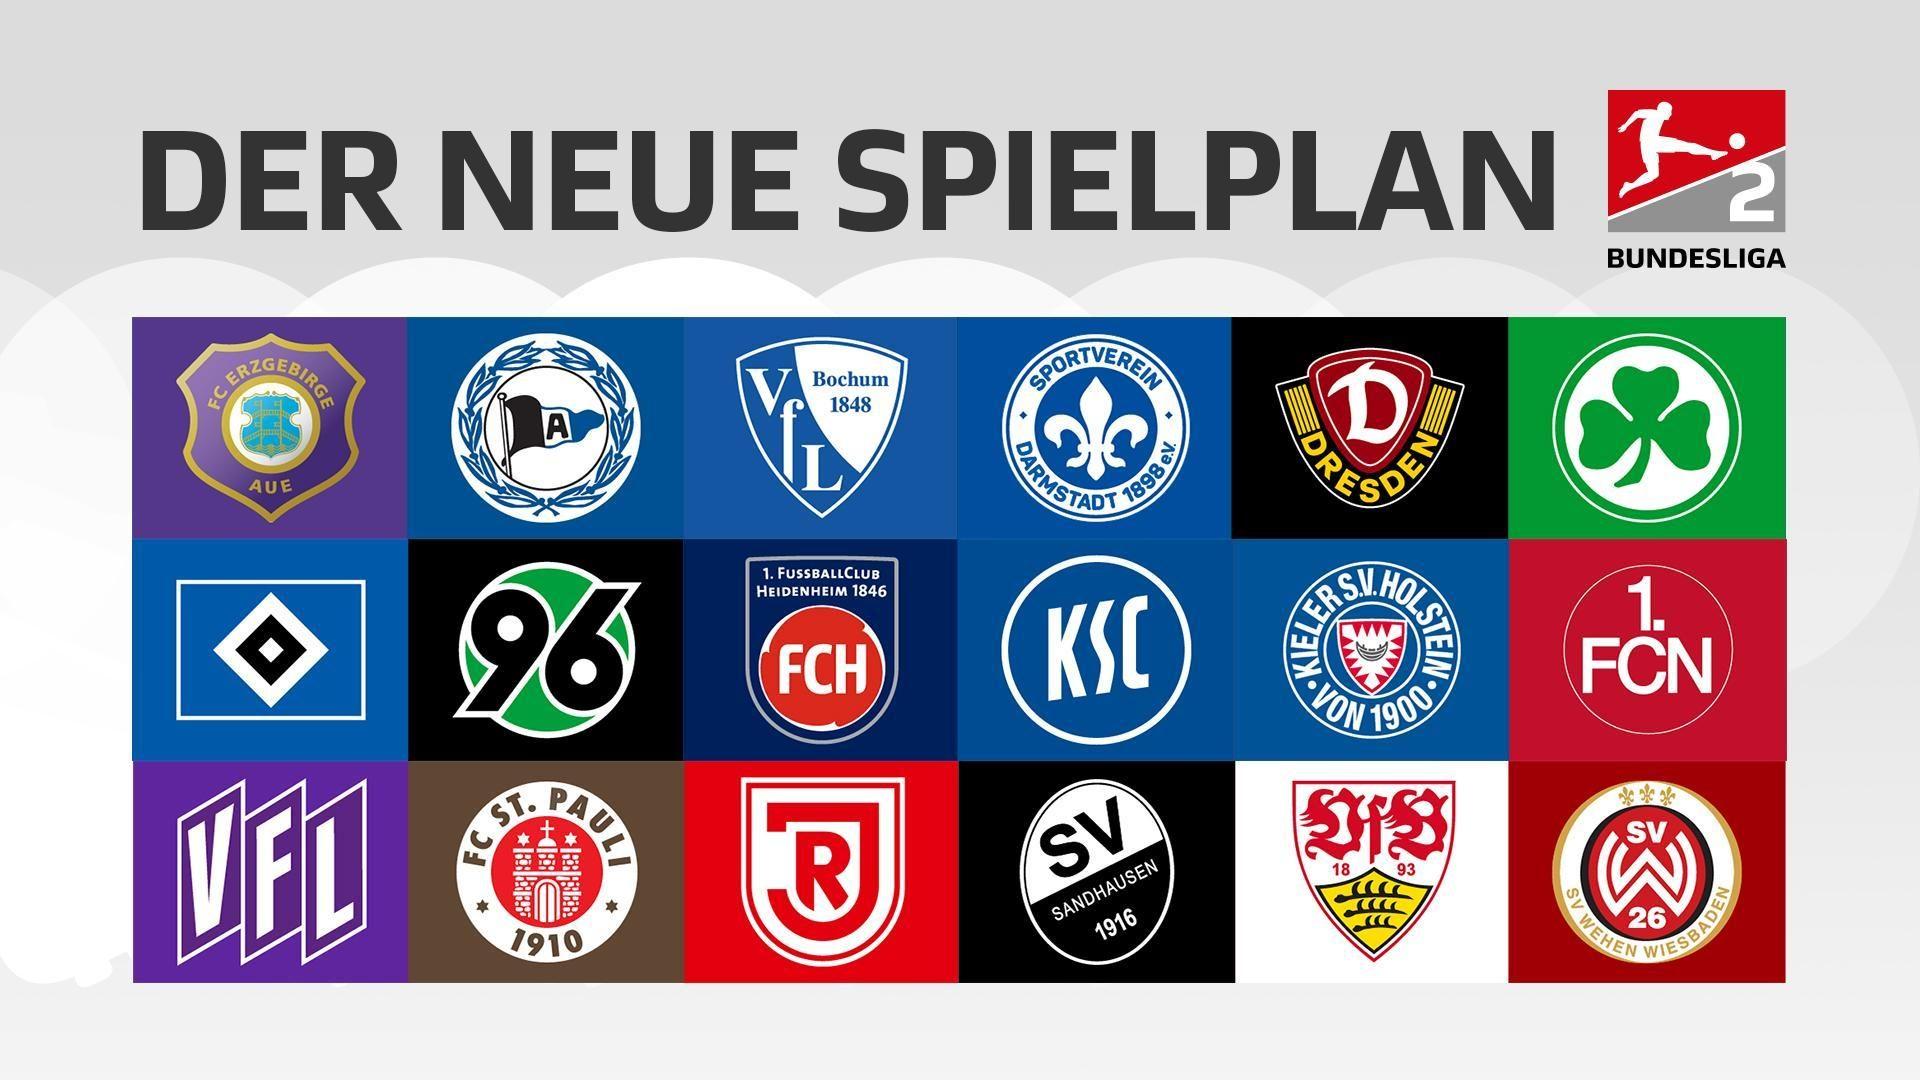 Calendario Bundesliga 2.Bundesliga Spielplane 2019 20 Bundesliga Auftakt Zwischen